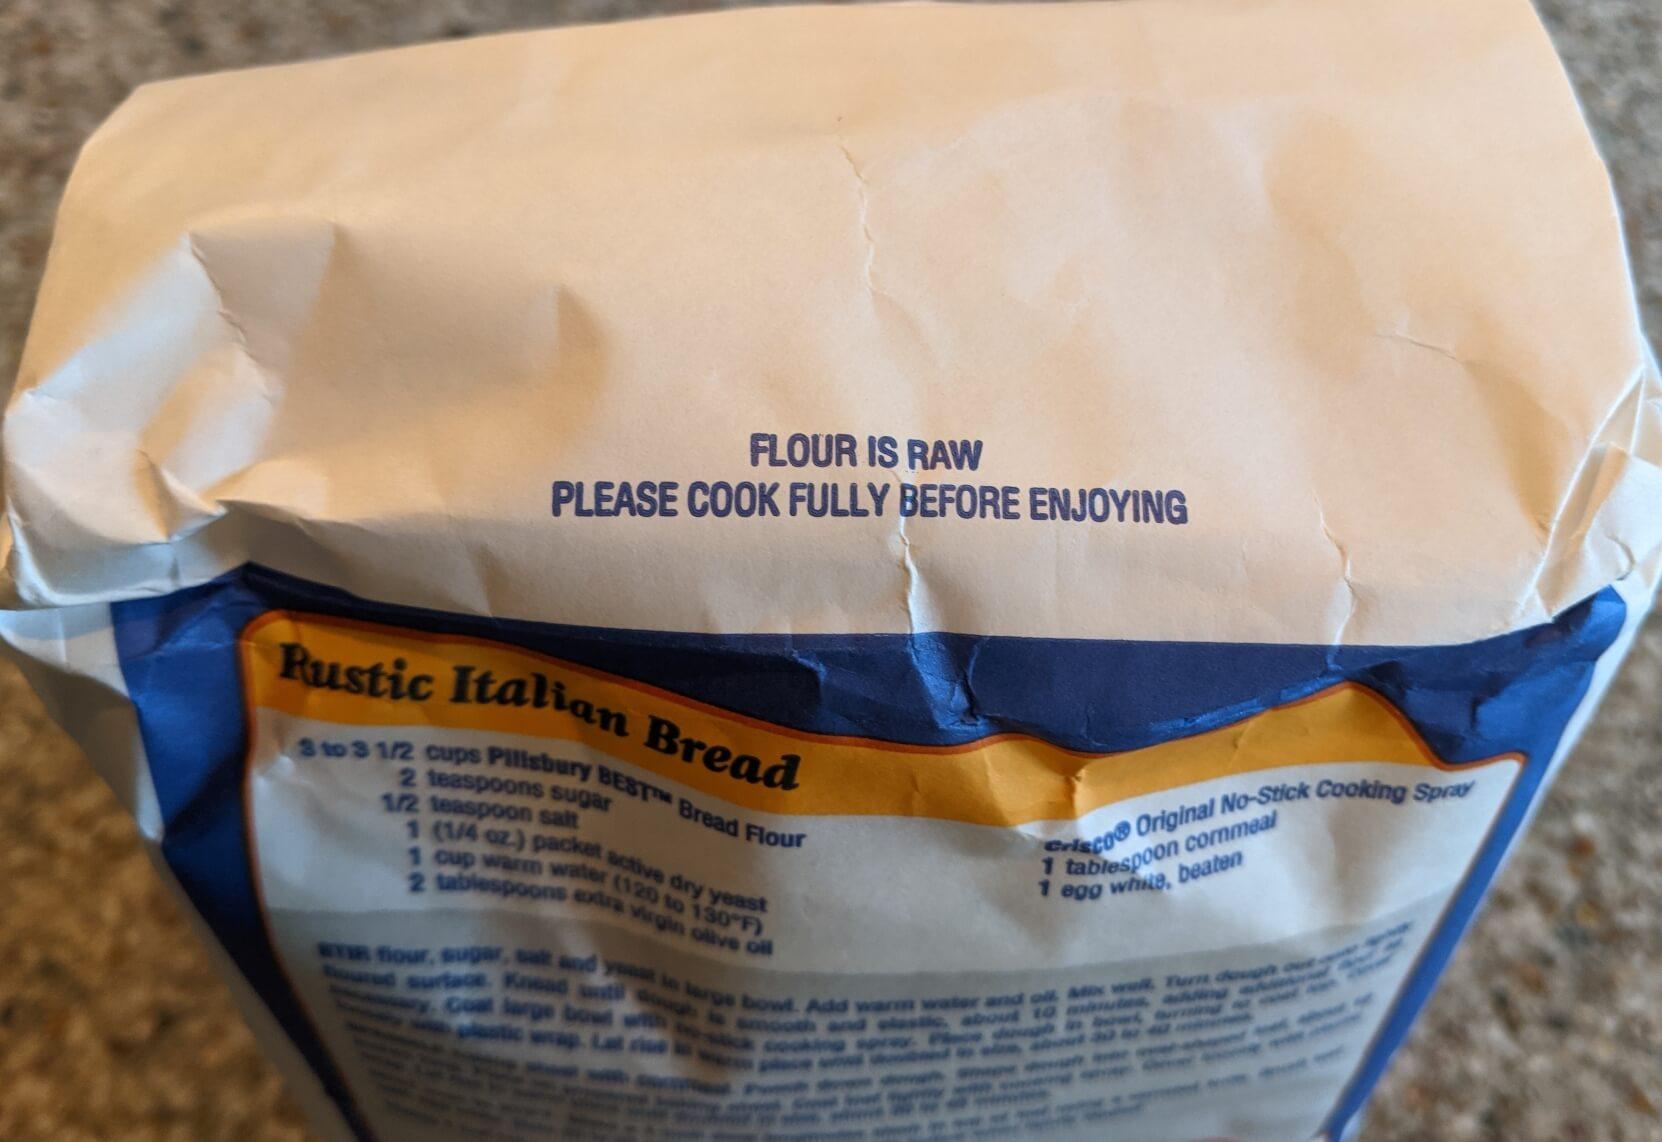 Flour warning